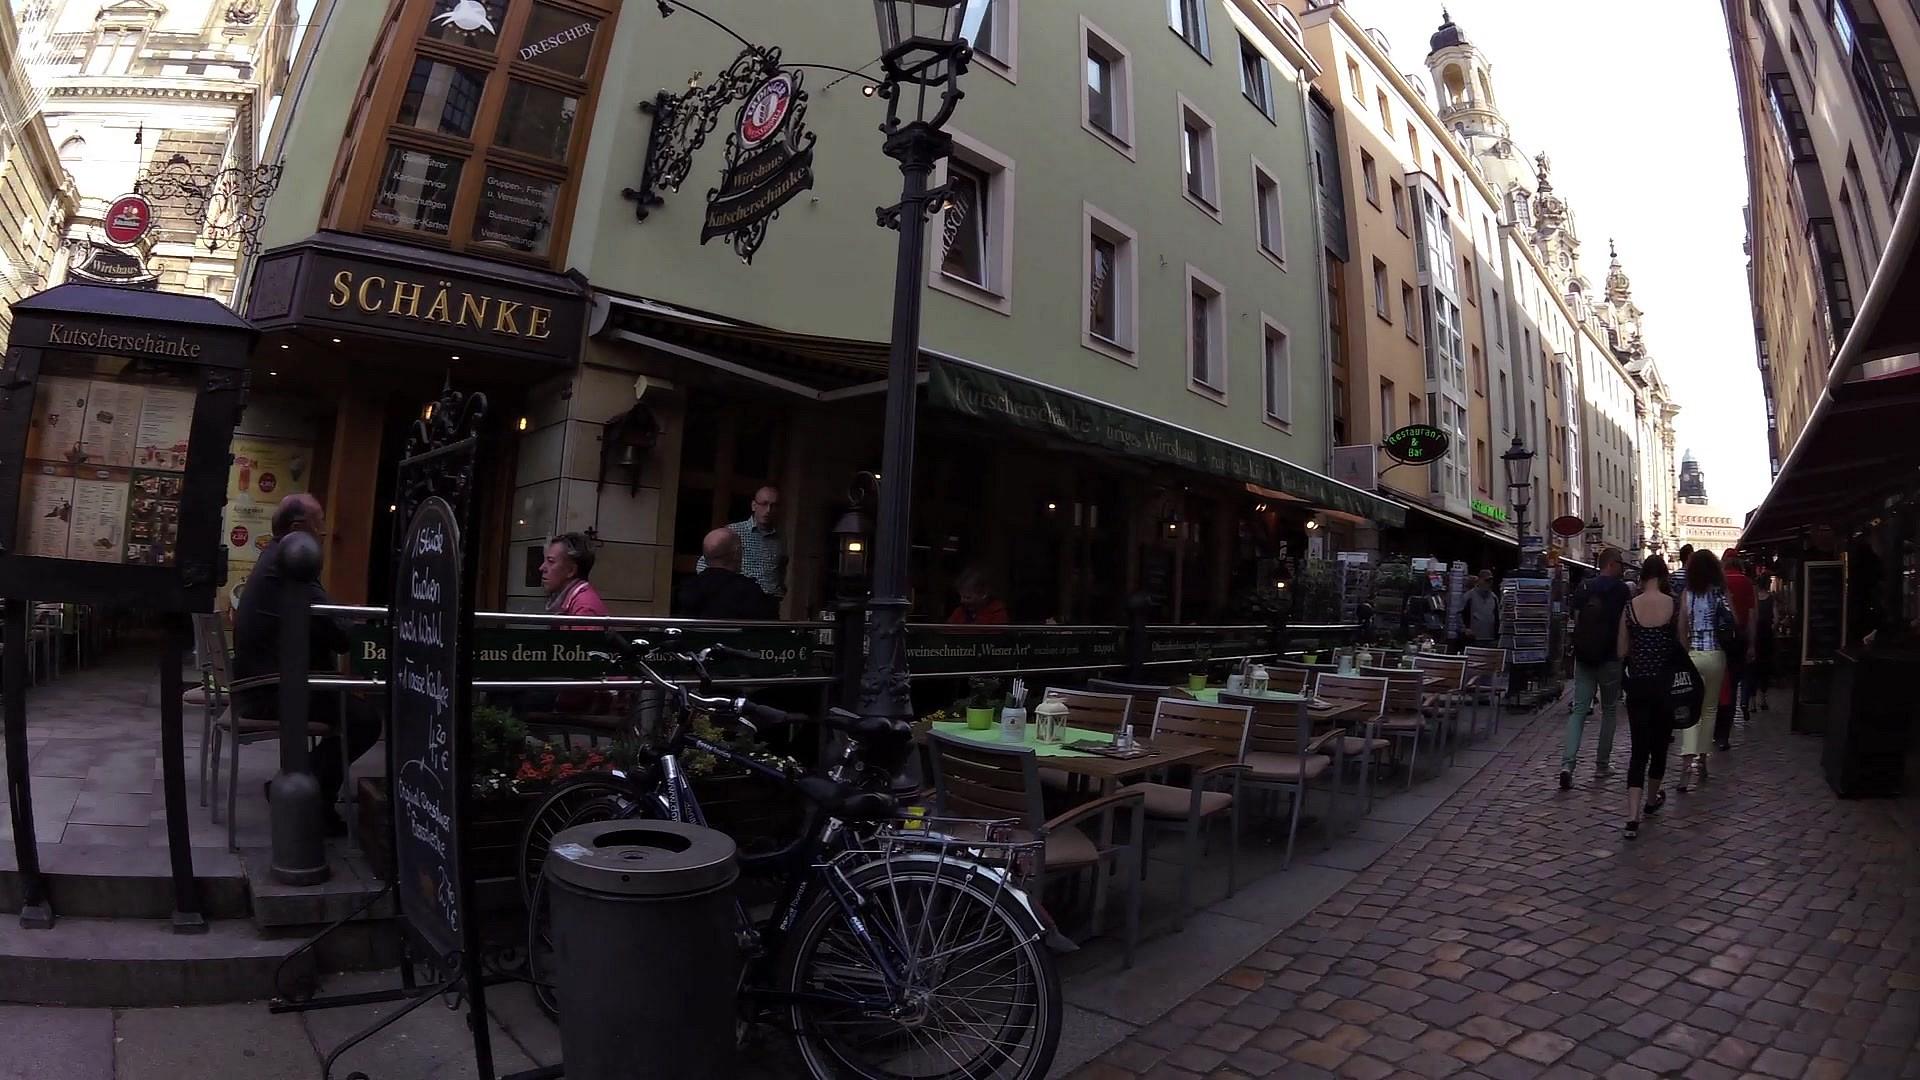 Spaziergang durch Dresdner Altstadt - Videostrecke - Livetouring.com